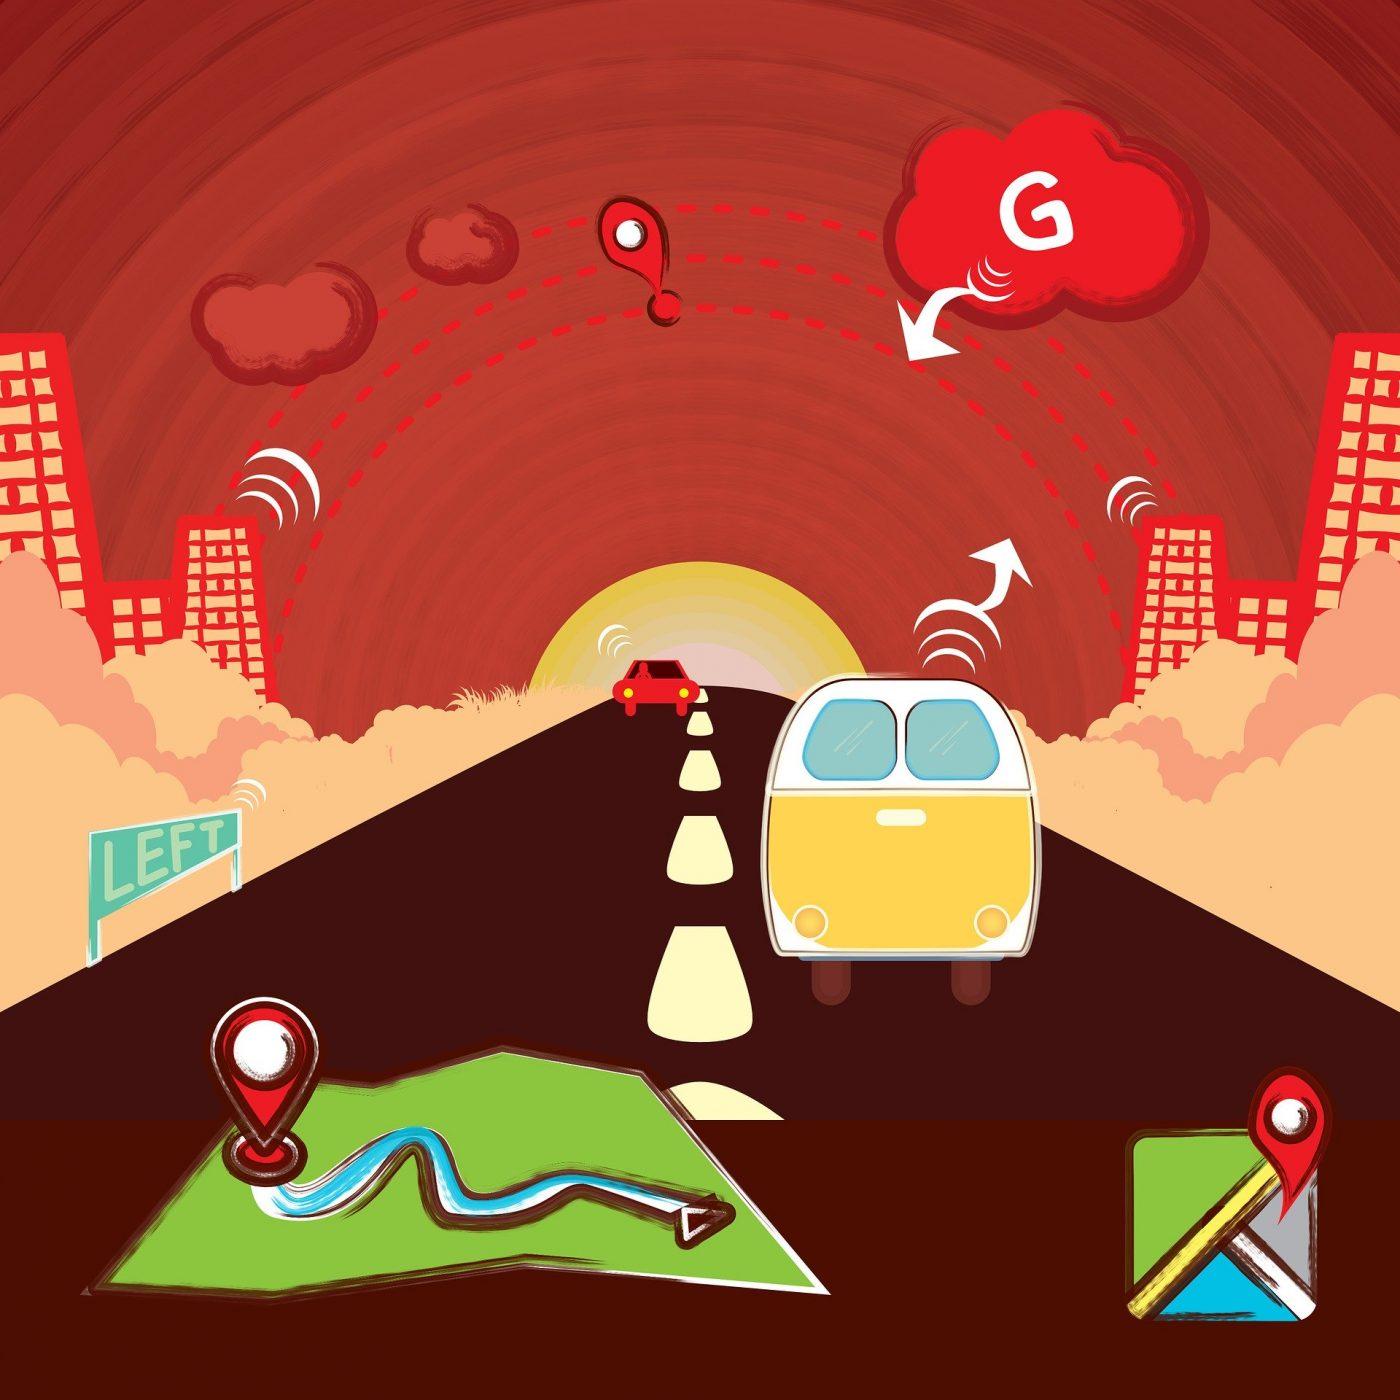 Illustration zum Thema GPS-Ortung